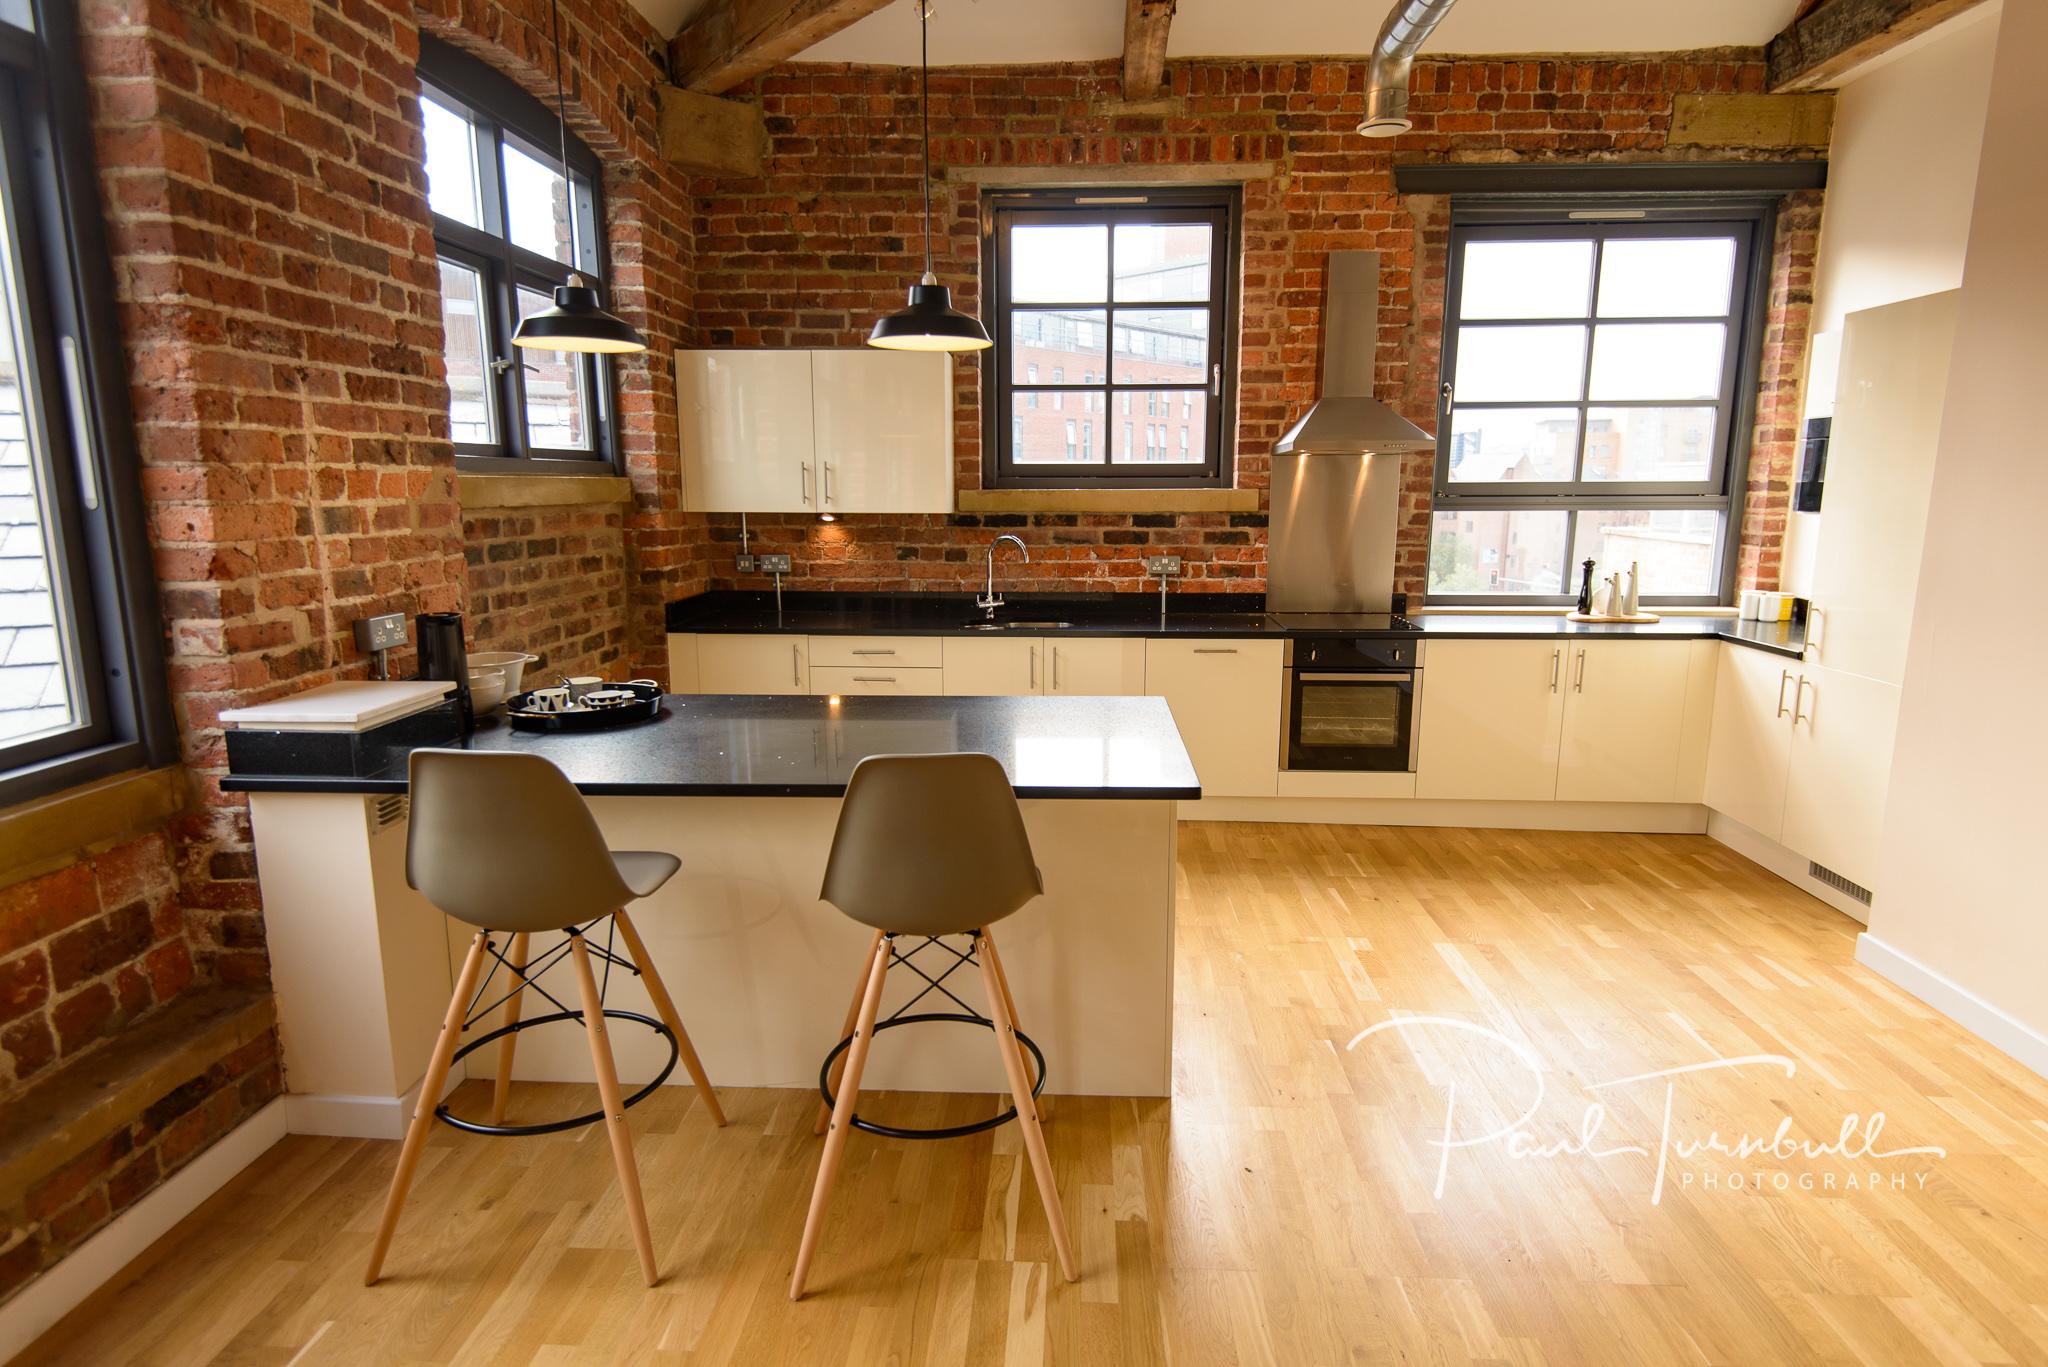 commercial-property-photographer-leeds-yorkshire-blackbrook-developments-015.jpg